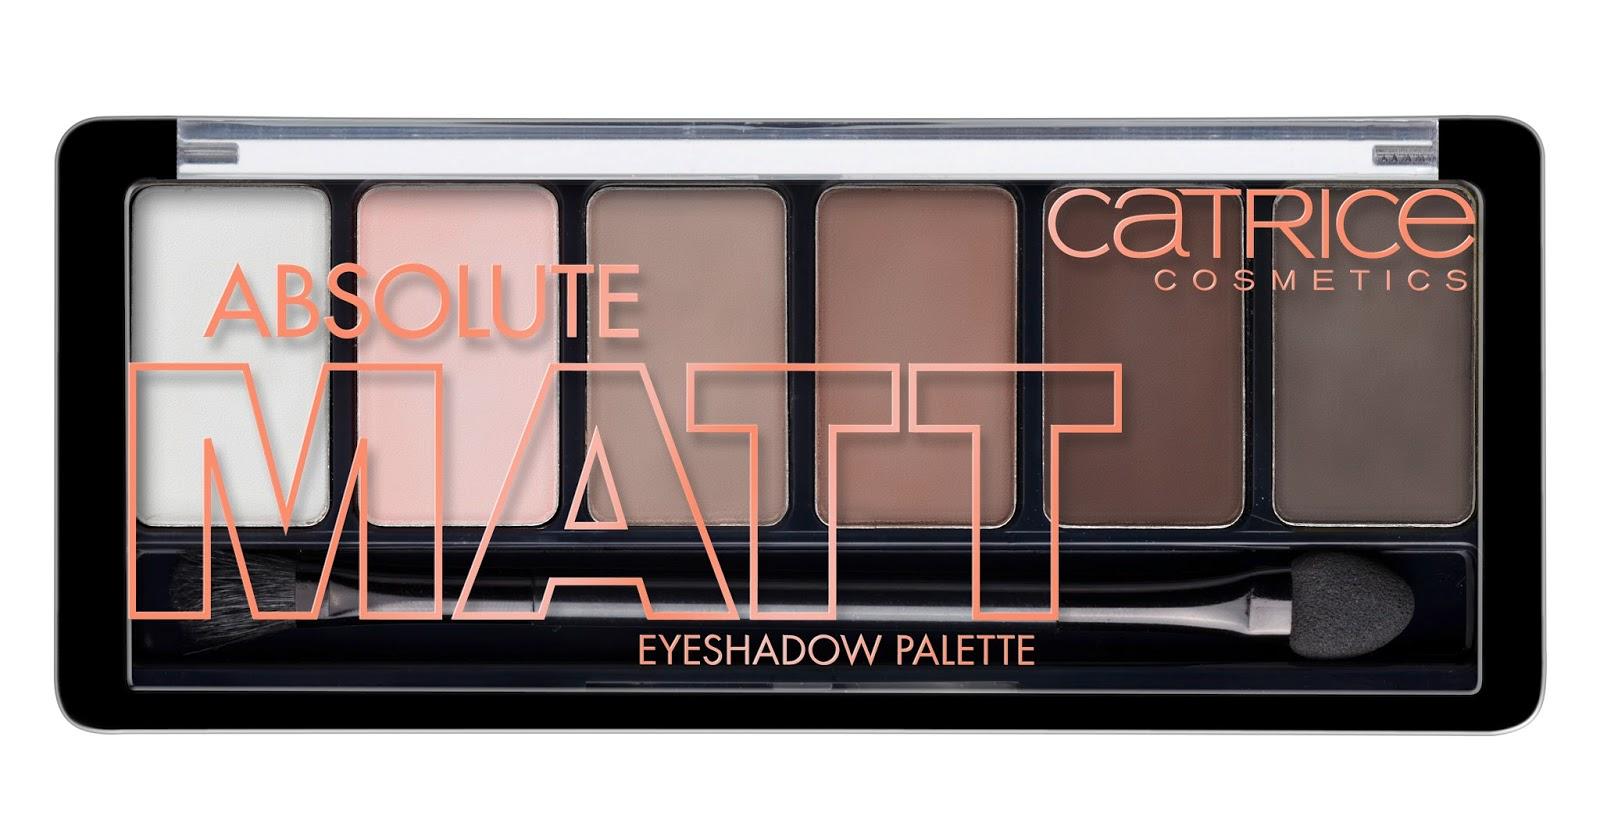 Catrice - Absolute Matt Eyeshadow Palette